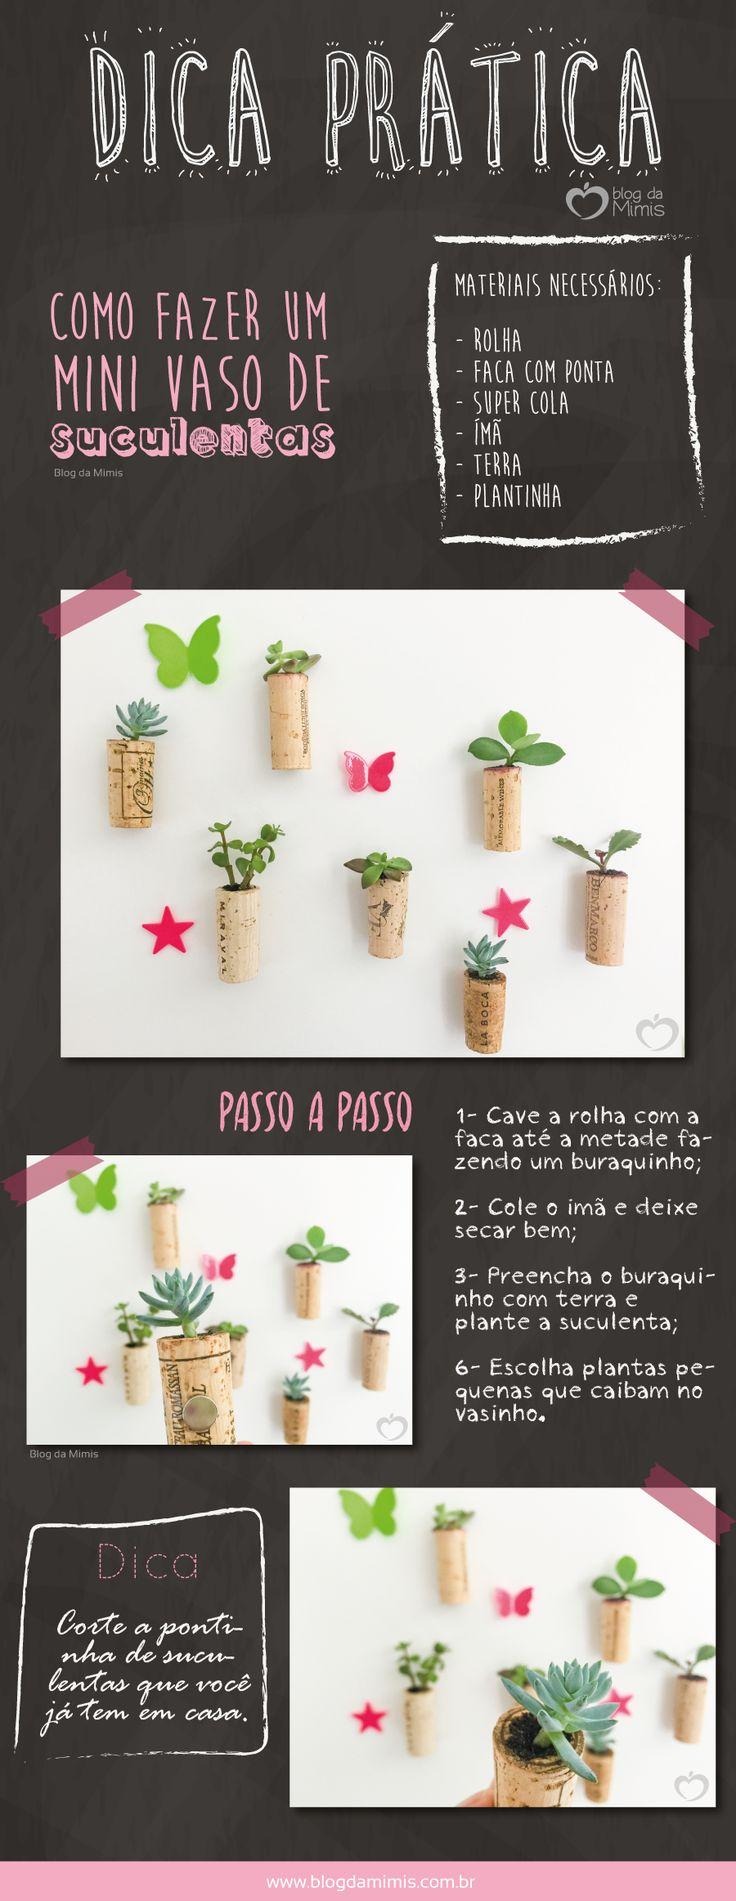 Como fazer um mini vaso de suculentas - Blog da Mimis #infográfico #blogdamimis #vaso #rolha #suculentas #ímã #decor #diy